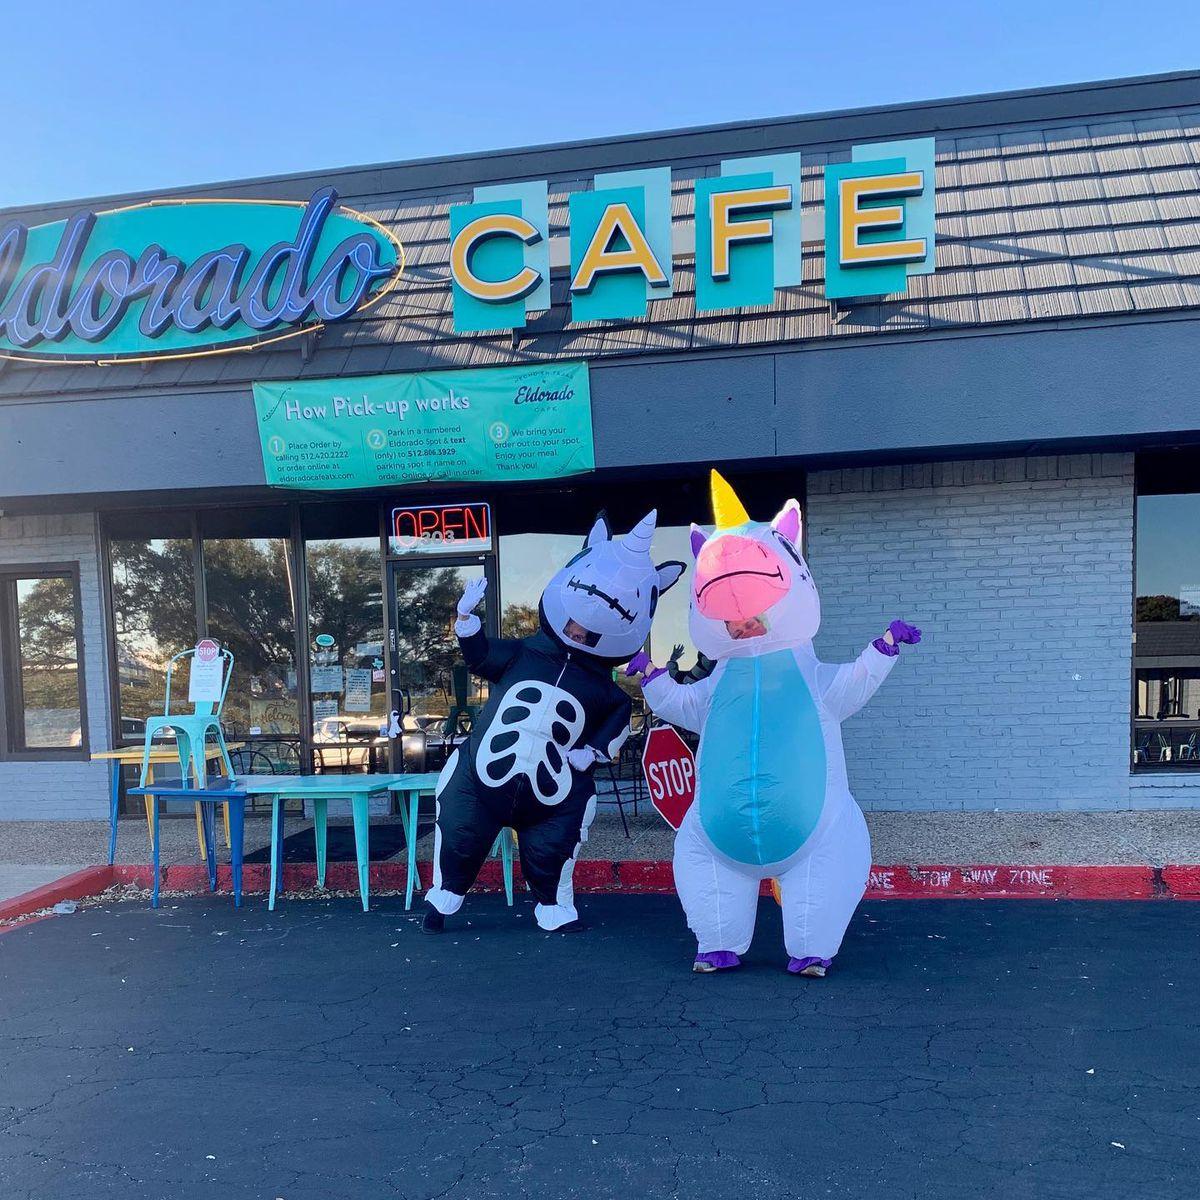 The Eldorado Cafe staff in inflatable unicorn costumes